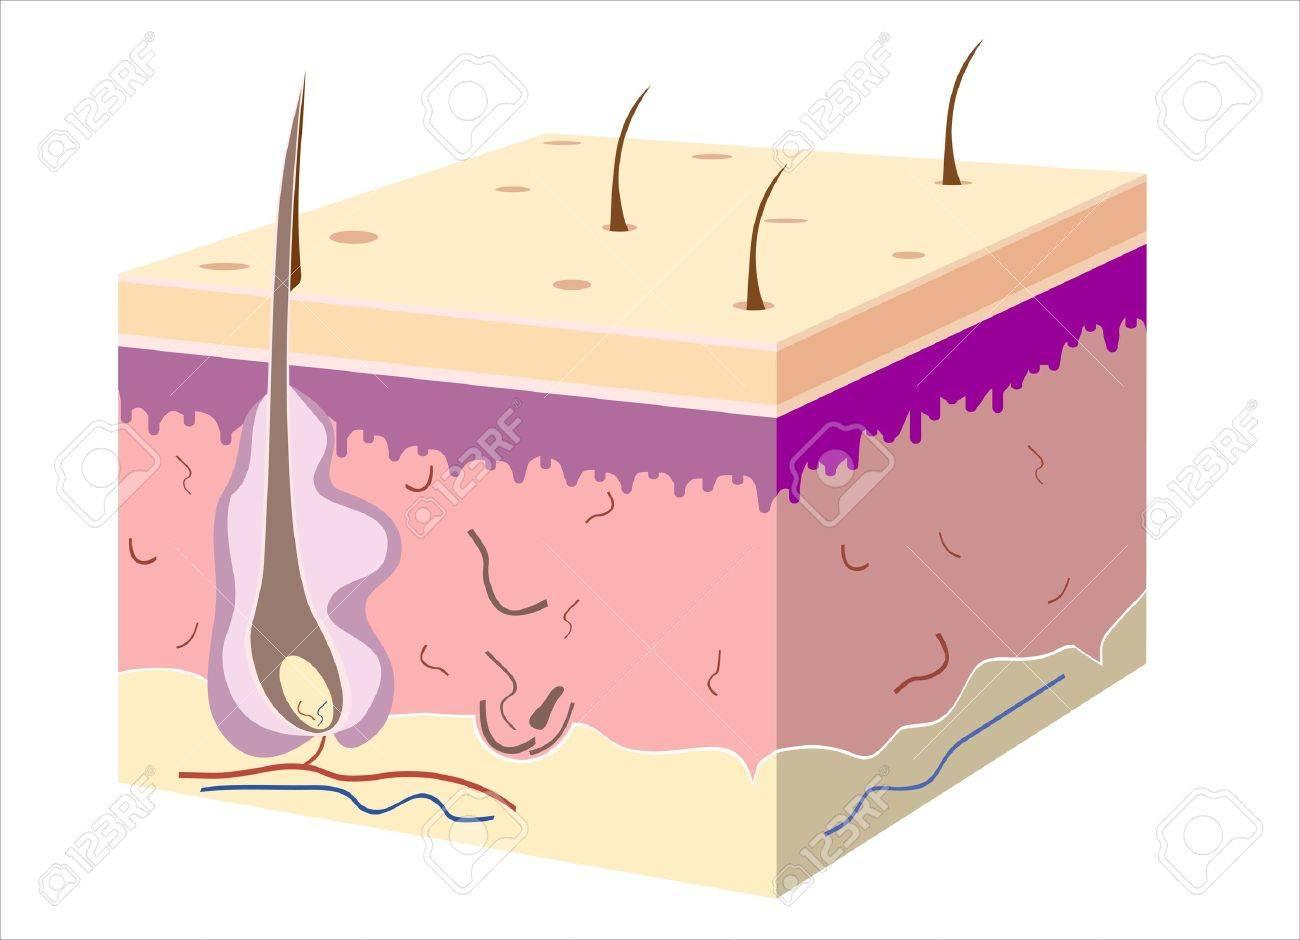 3D skin oblique with cut away epidermis - 17483915